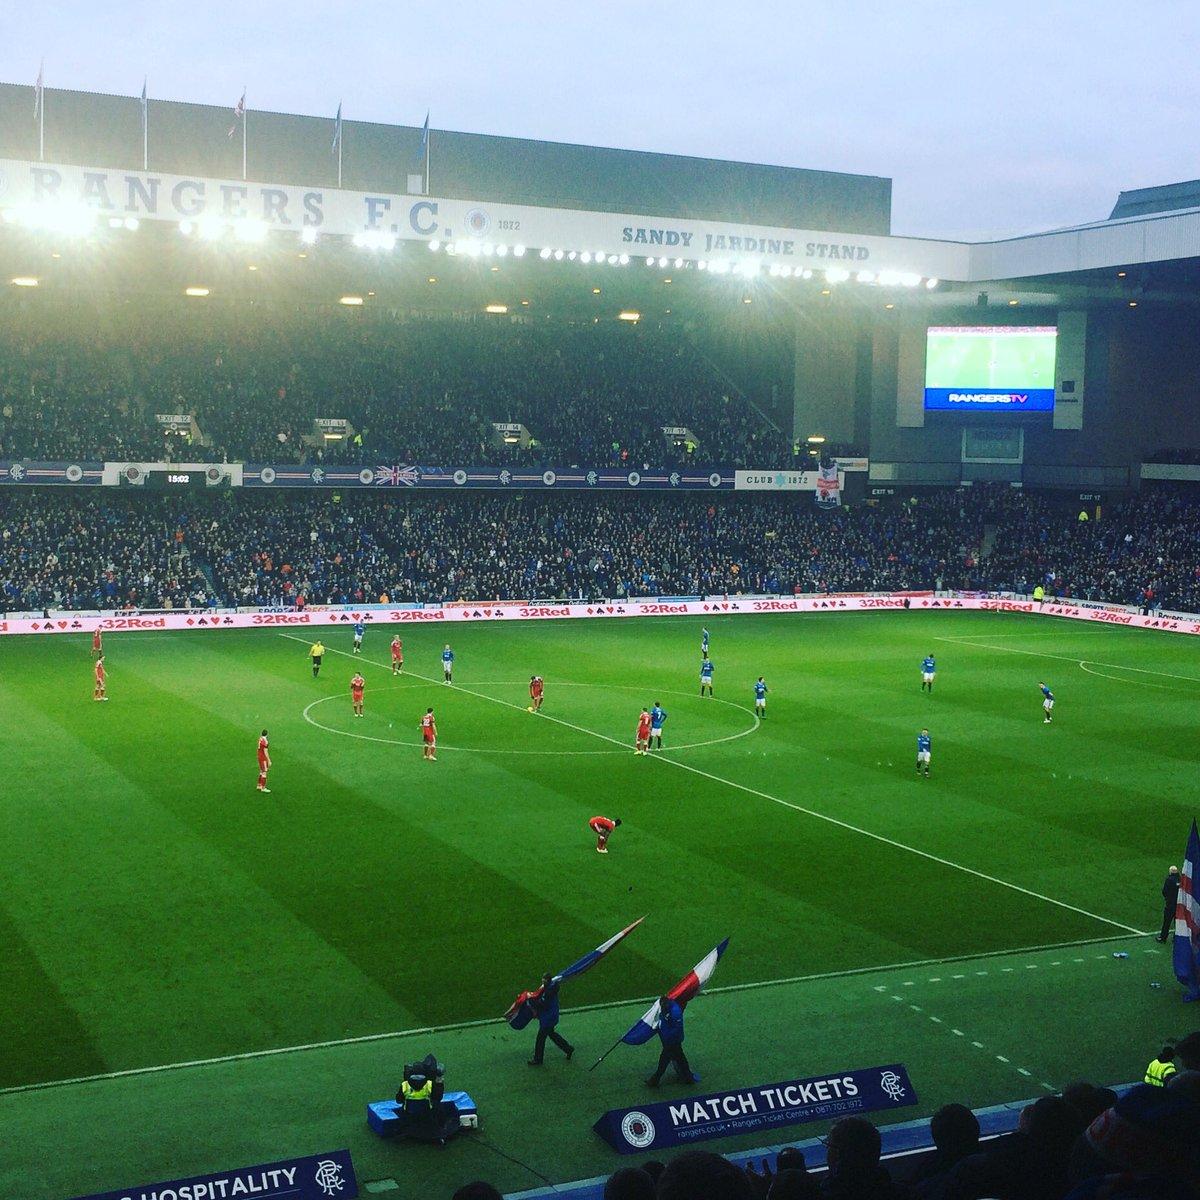 @RangersFC v @AberdeenFC earlier at Ibrox https://t.co/97t9uO9buZ